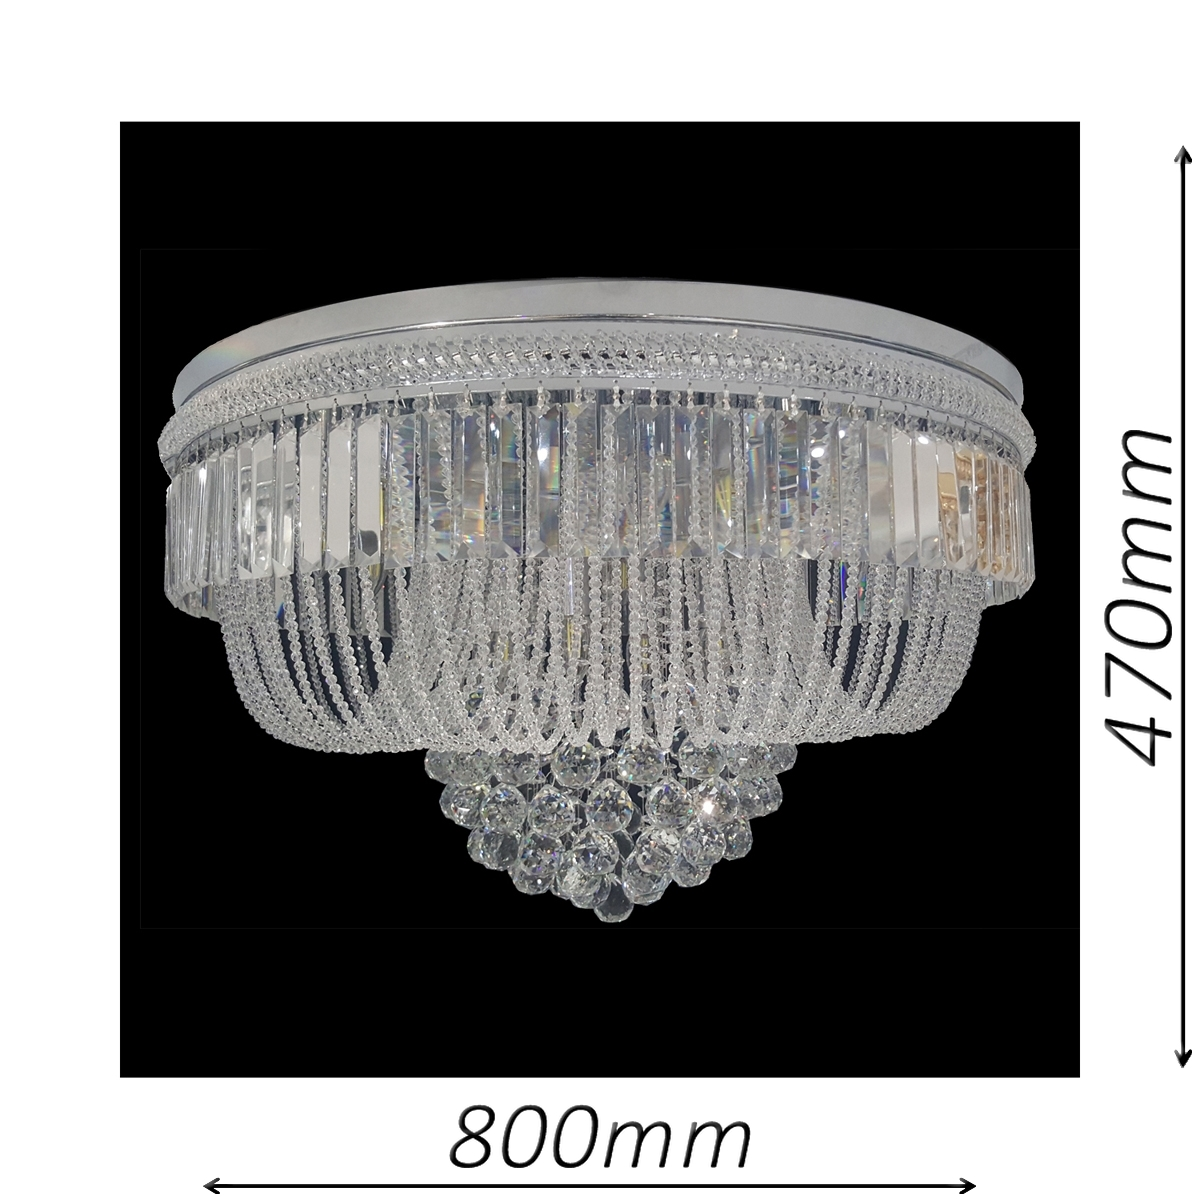 Warwick 800 Chrome Ceiling Light - CTCWAR14800CH